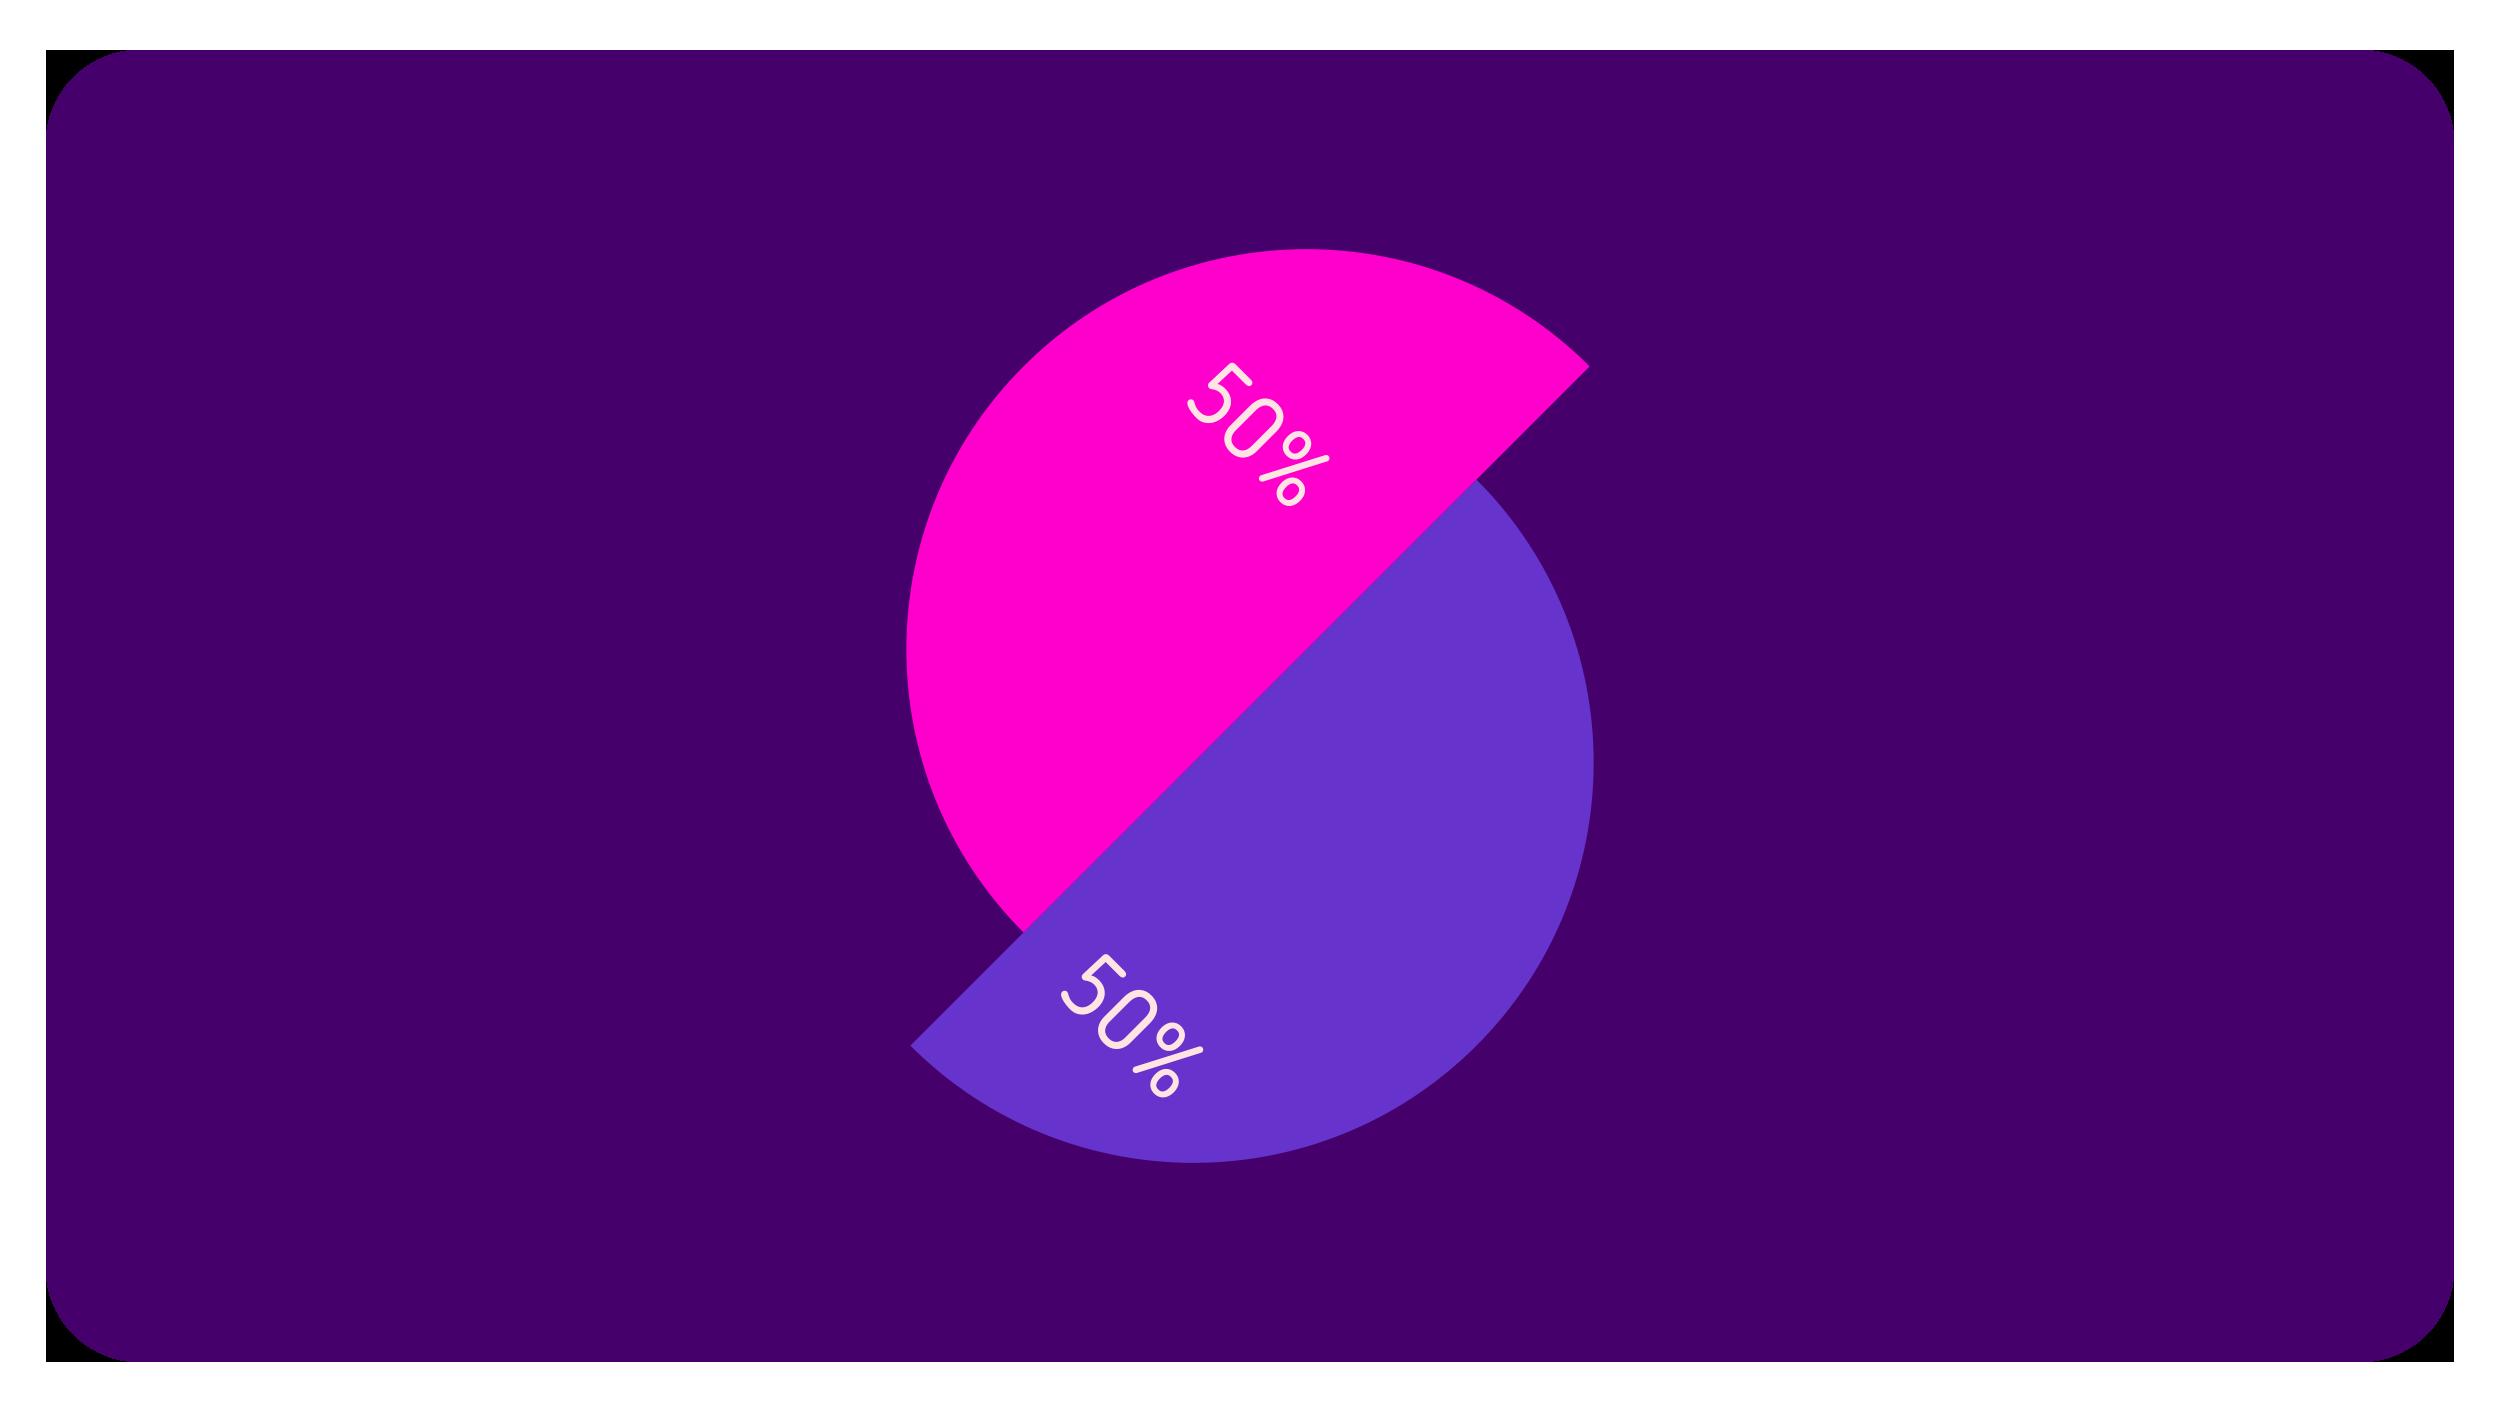 Tinder Convo Infographic